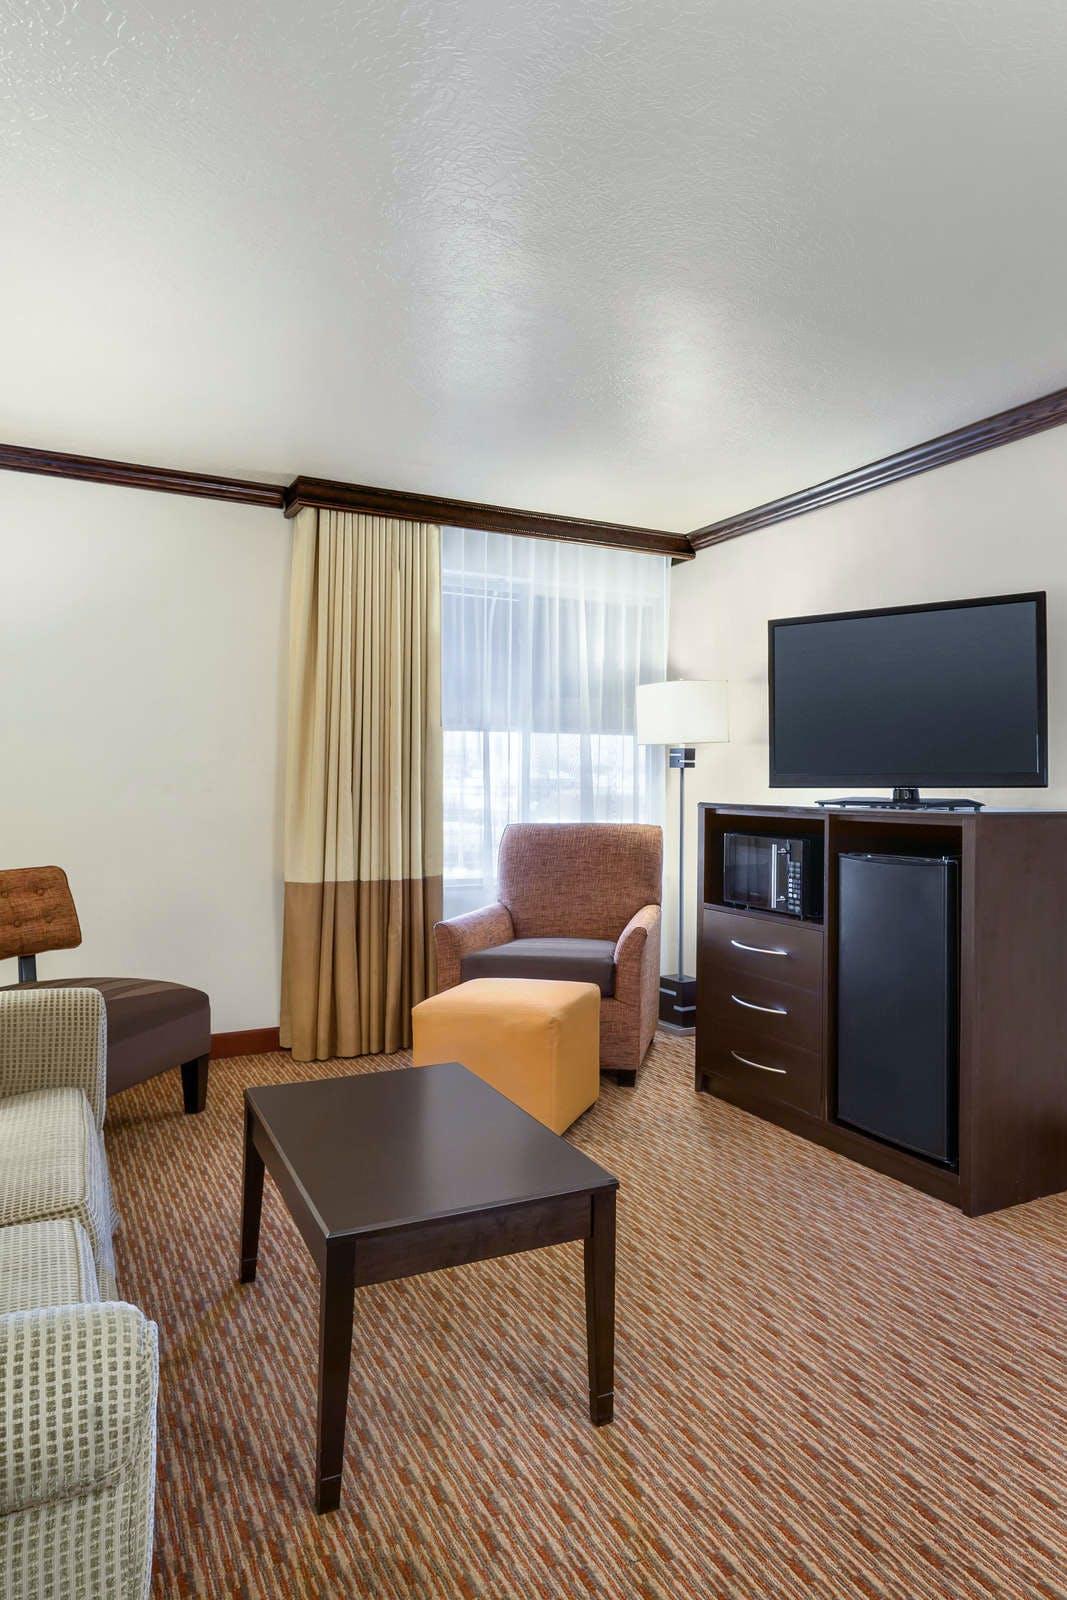 Park Inn by Radisson Salt Lake City Midvale